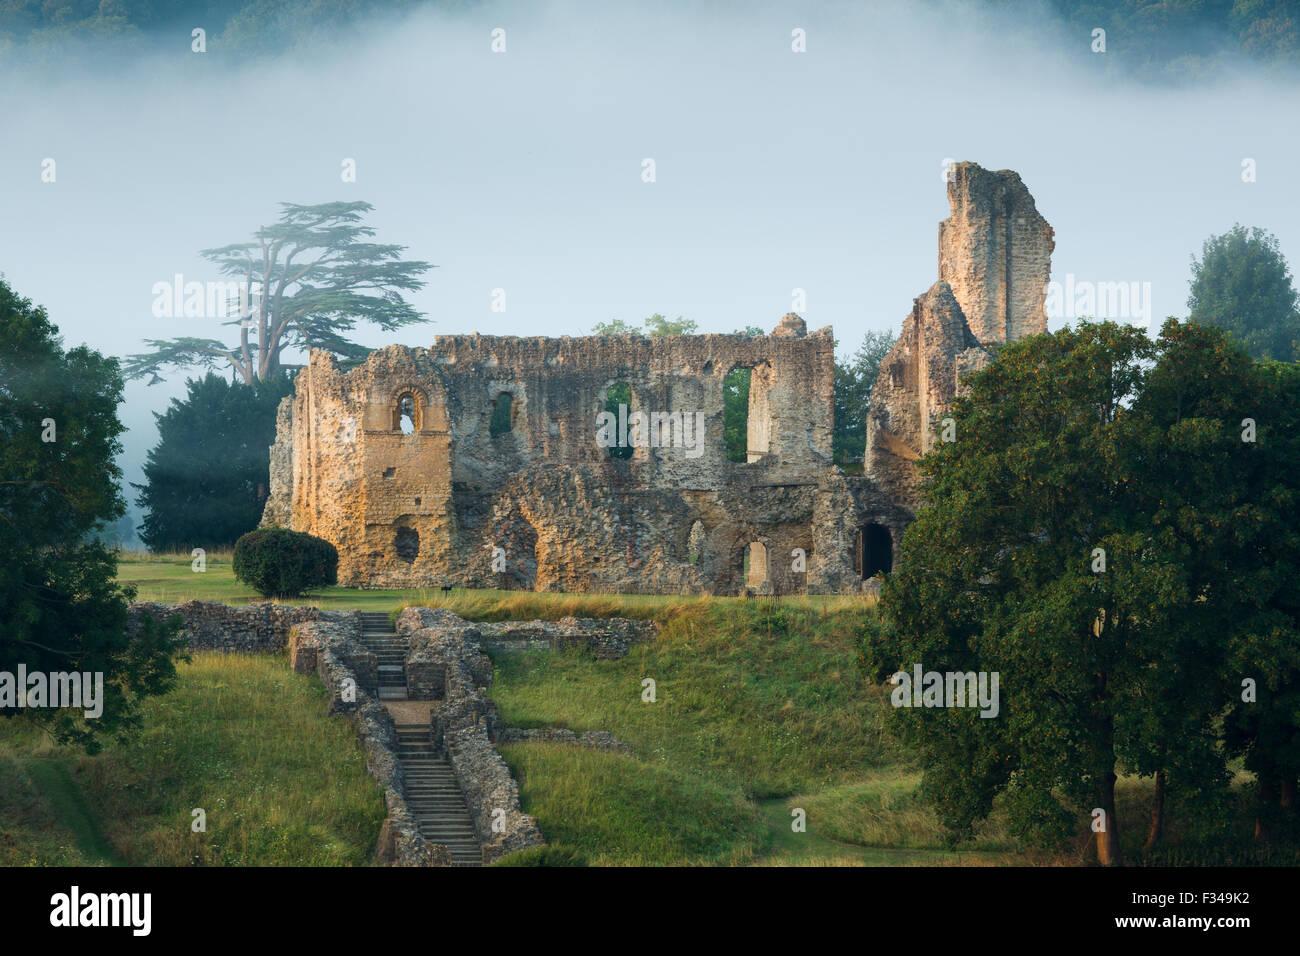 Old Sherborne Castle, Sherborne, Dorset, England, UK - Stock Image